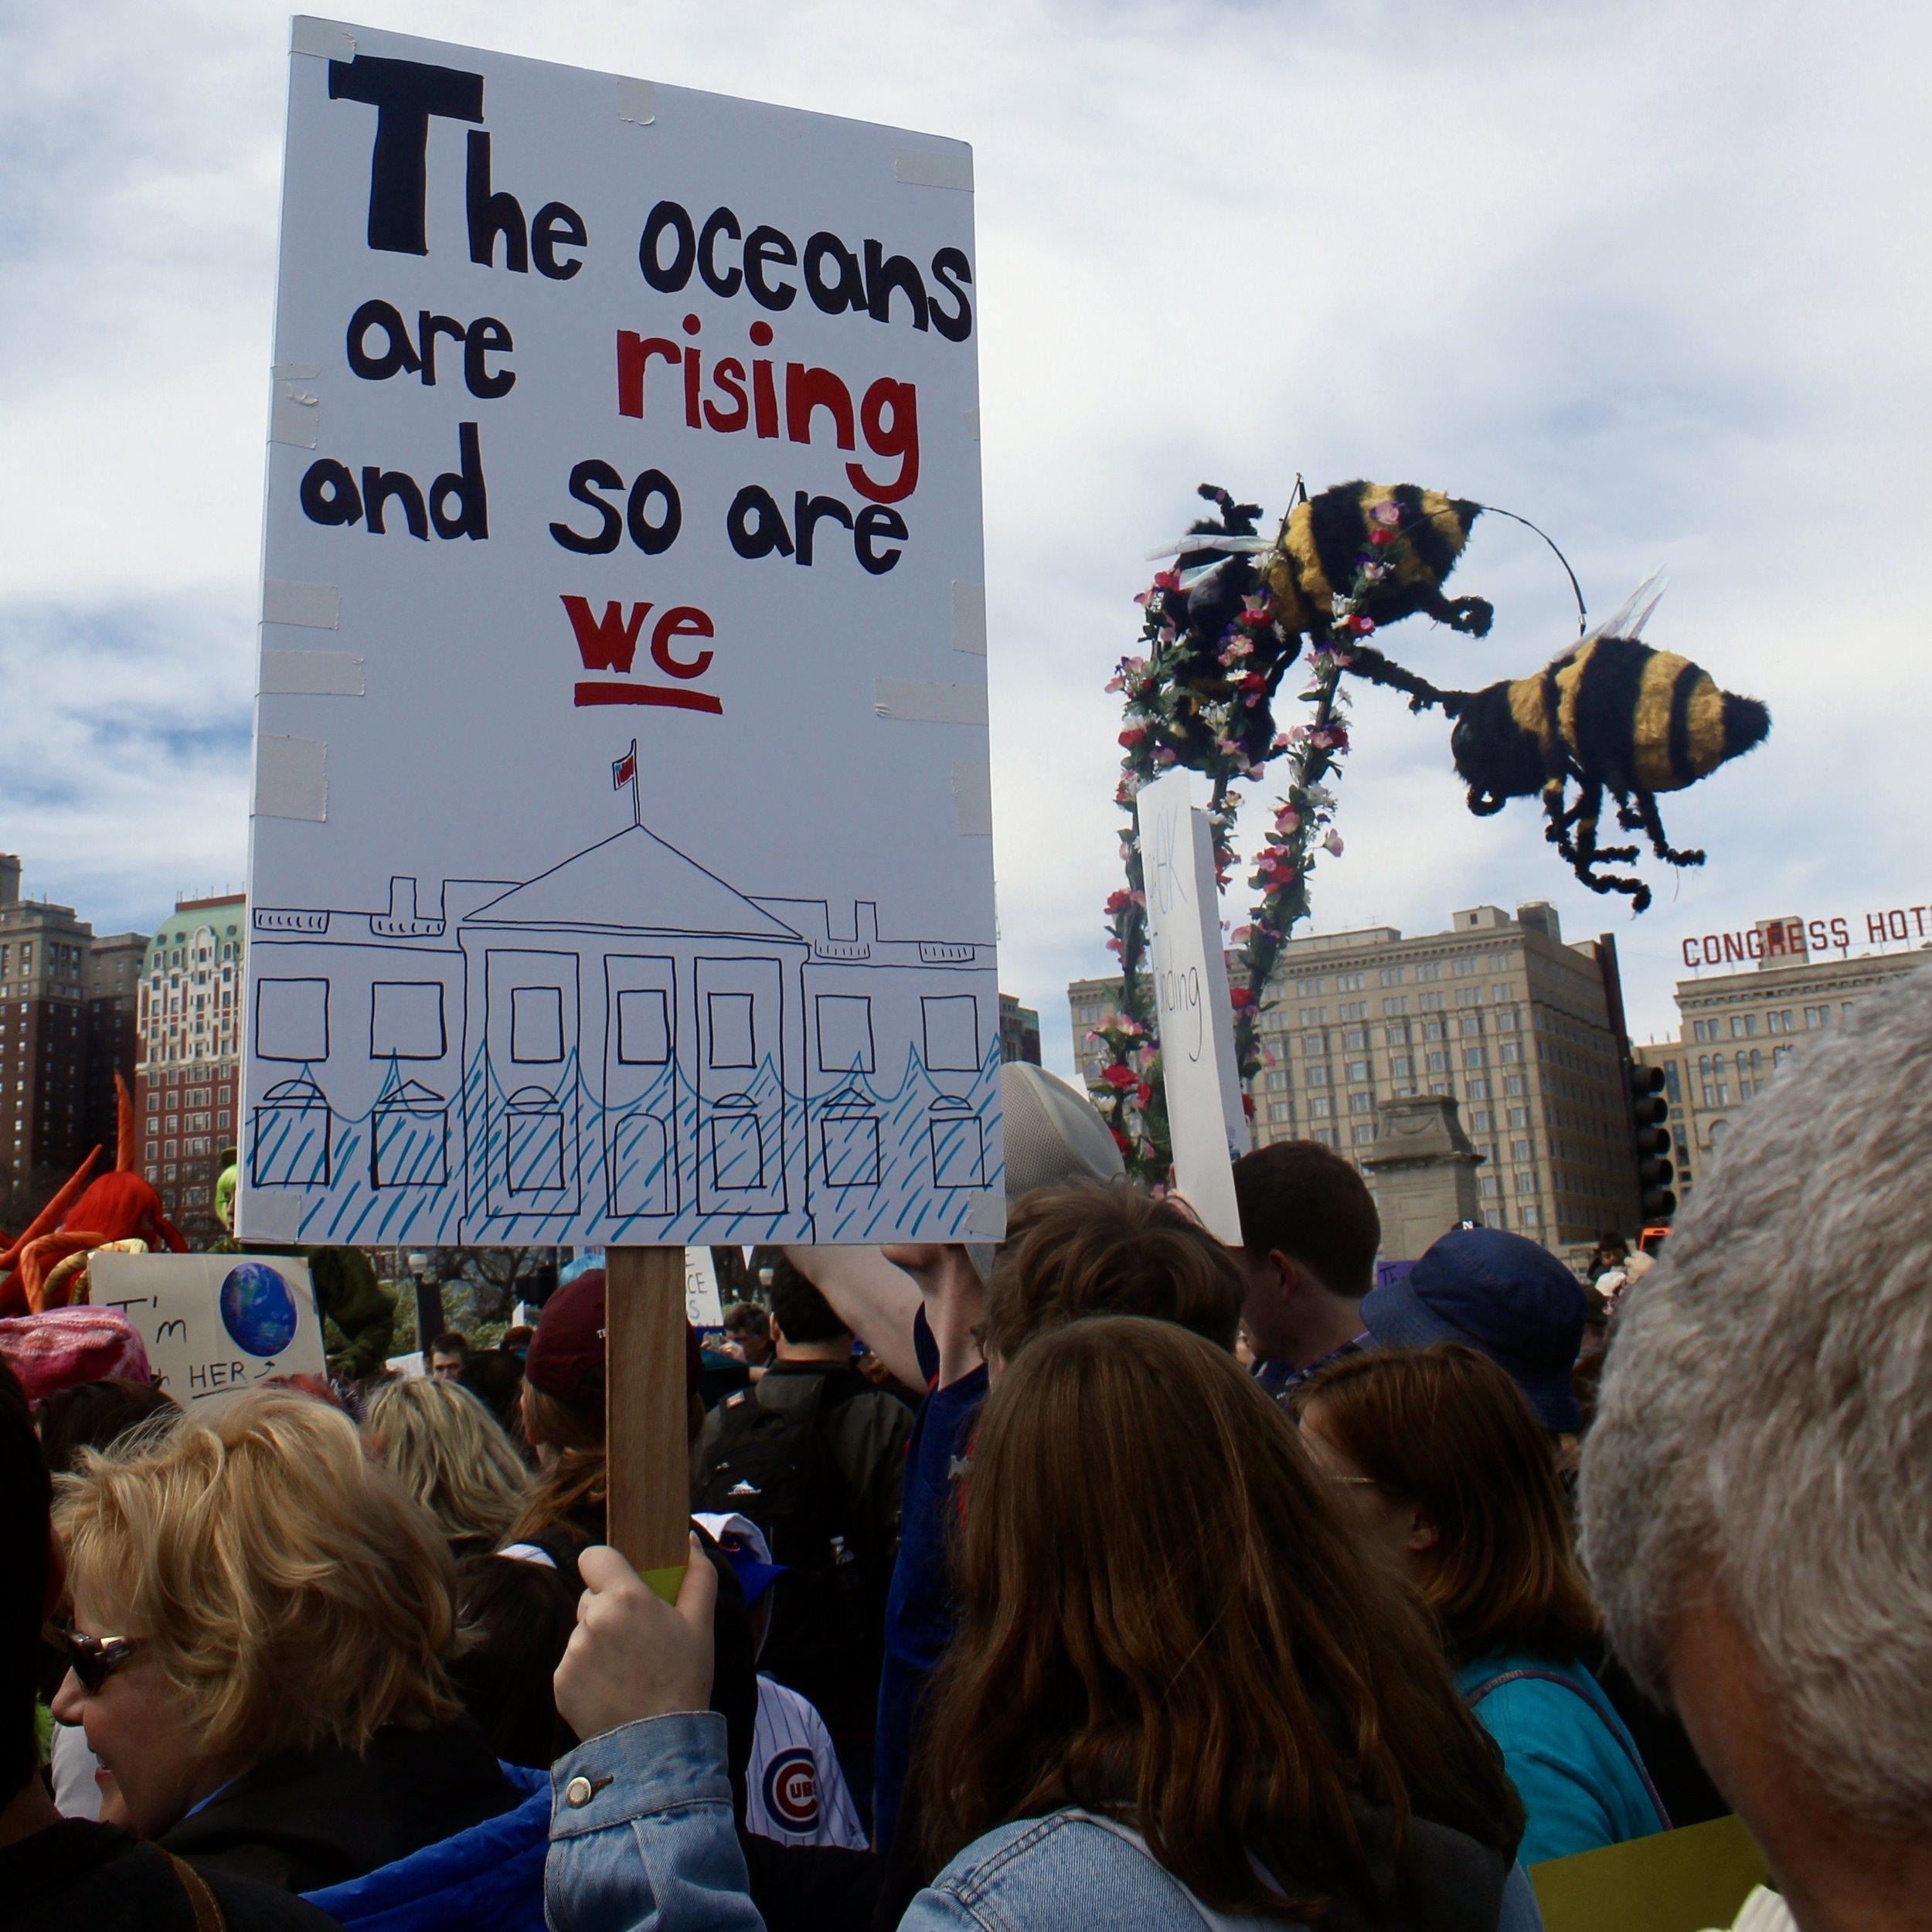 #ClimateRevolution #FreeAdmission #ExpensiveToRideTheBench